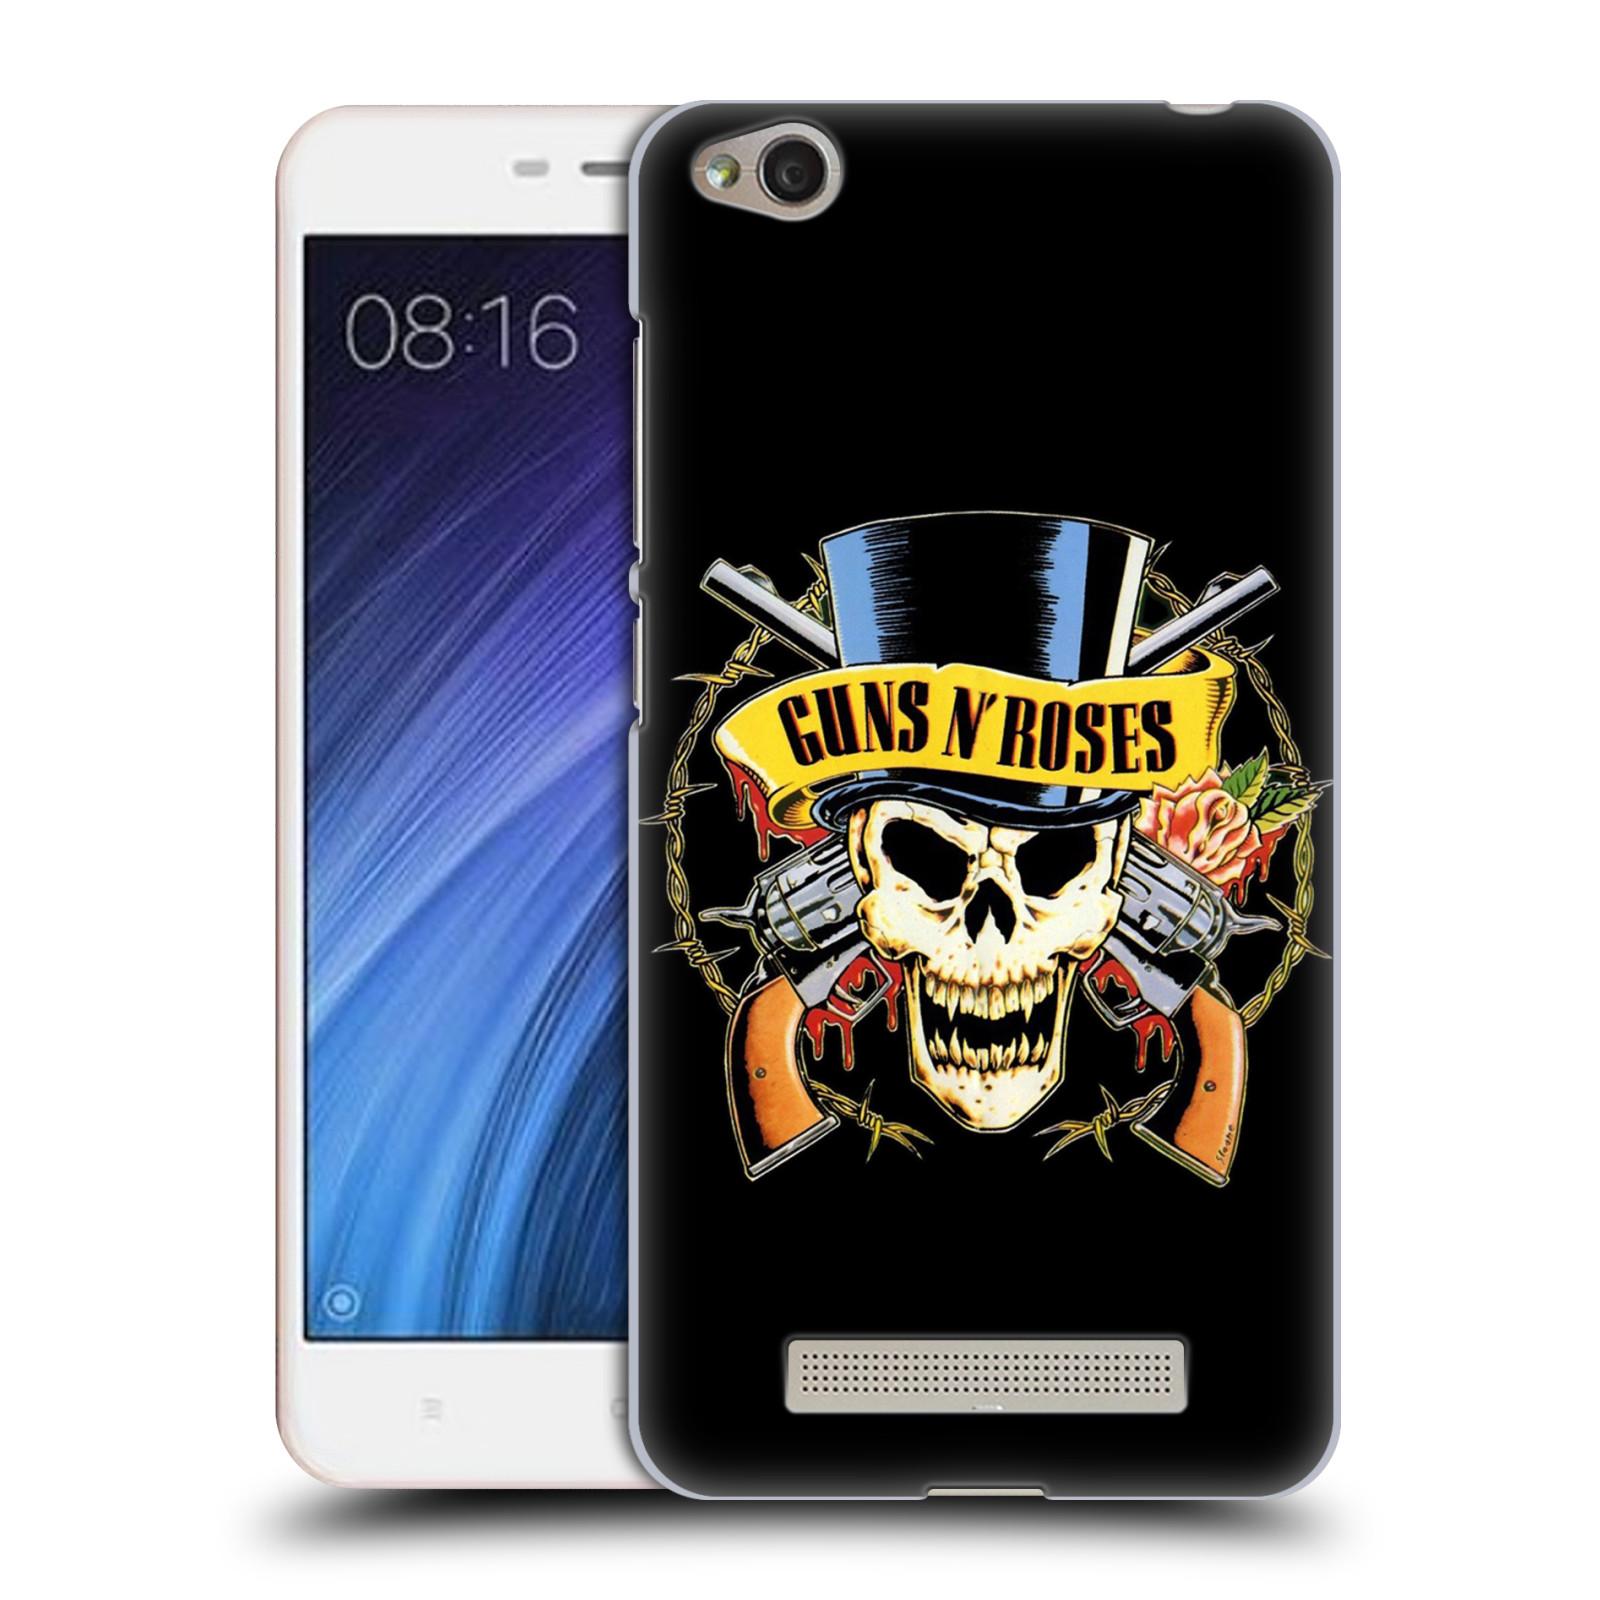 Plastové pouzdro na mobil Xiaomi Redmi 4A HEAD CASE Guns N' Roses - Lebka